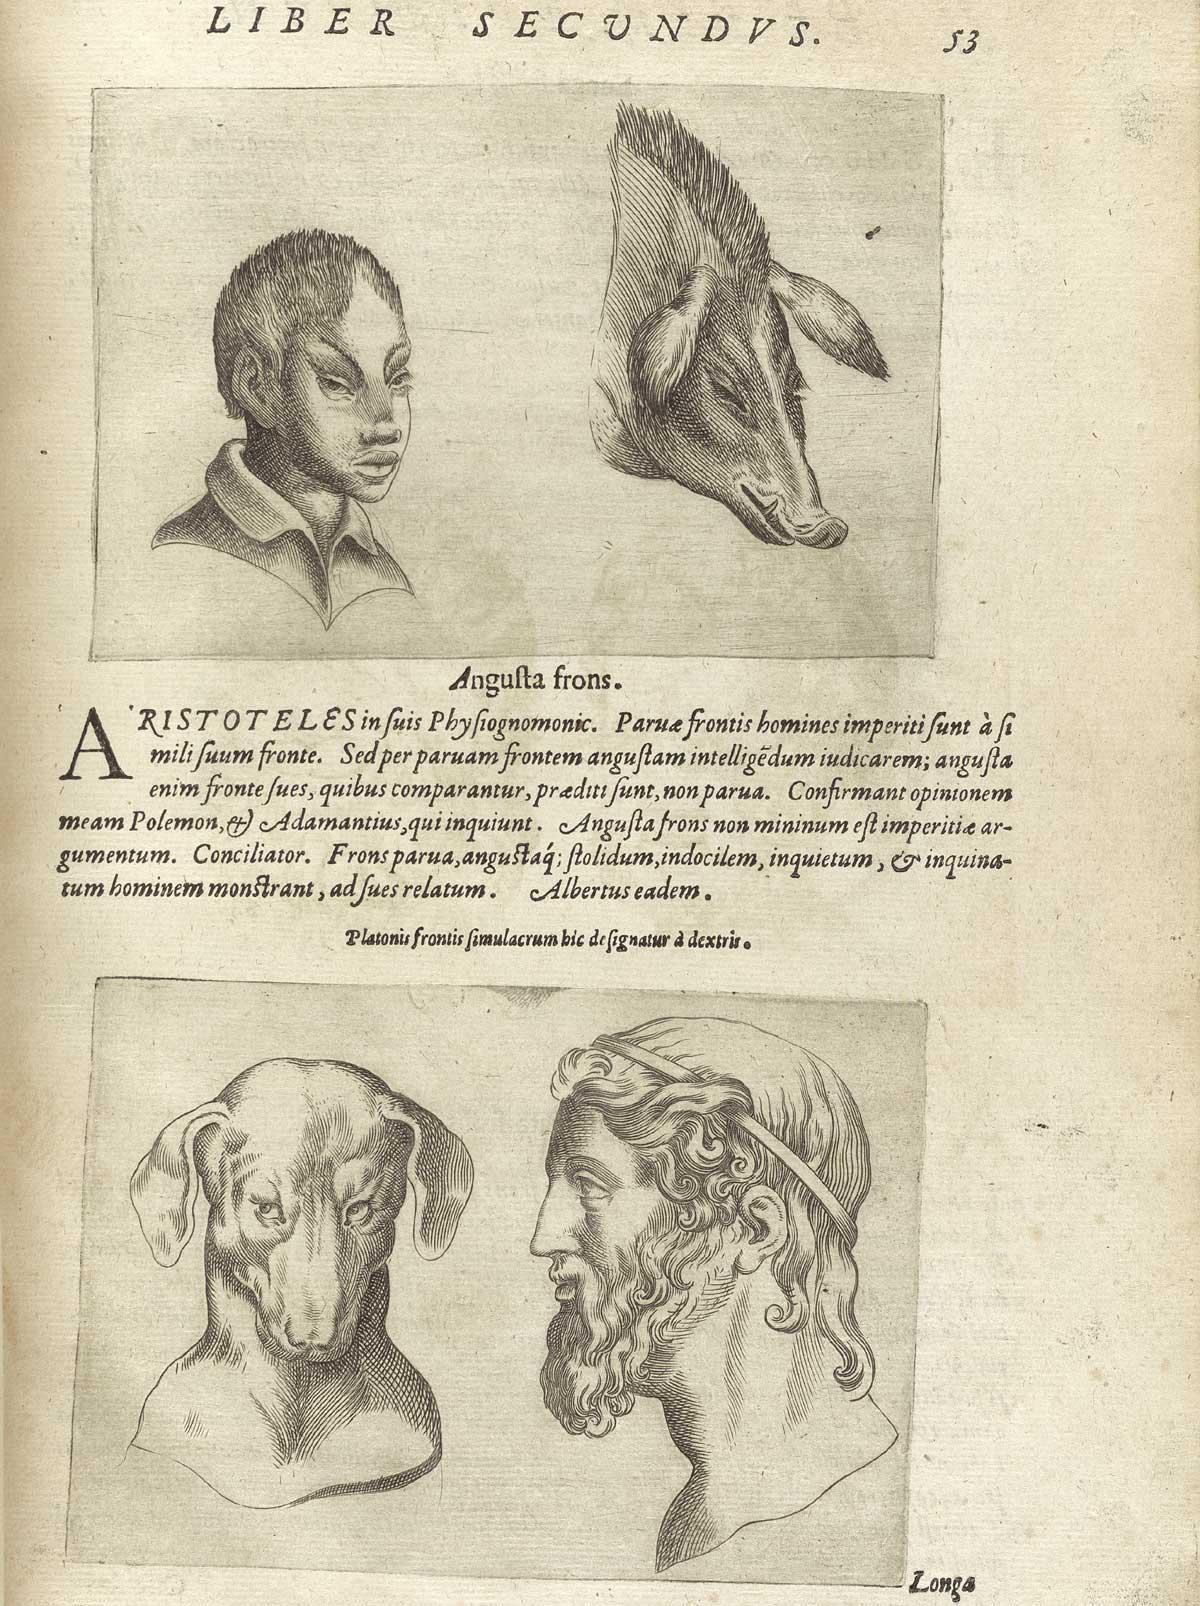 http://www.nlm.nih.gov/exhibition/historicalanatomies/Images/1200_pixels/porta_p53.jpg